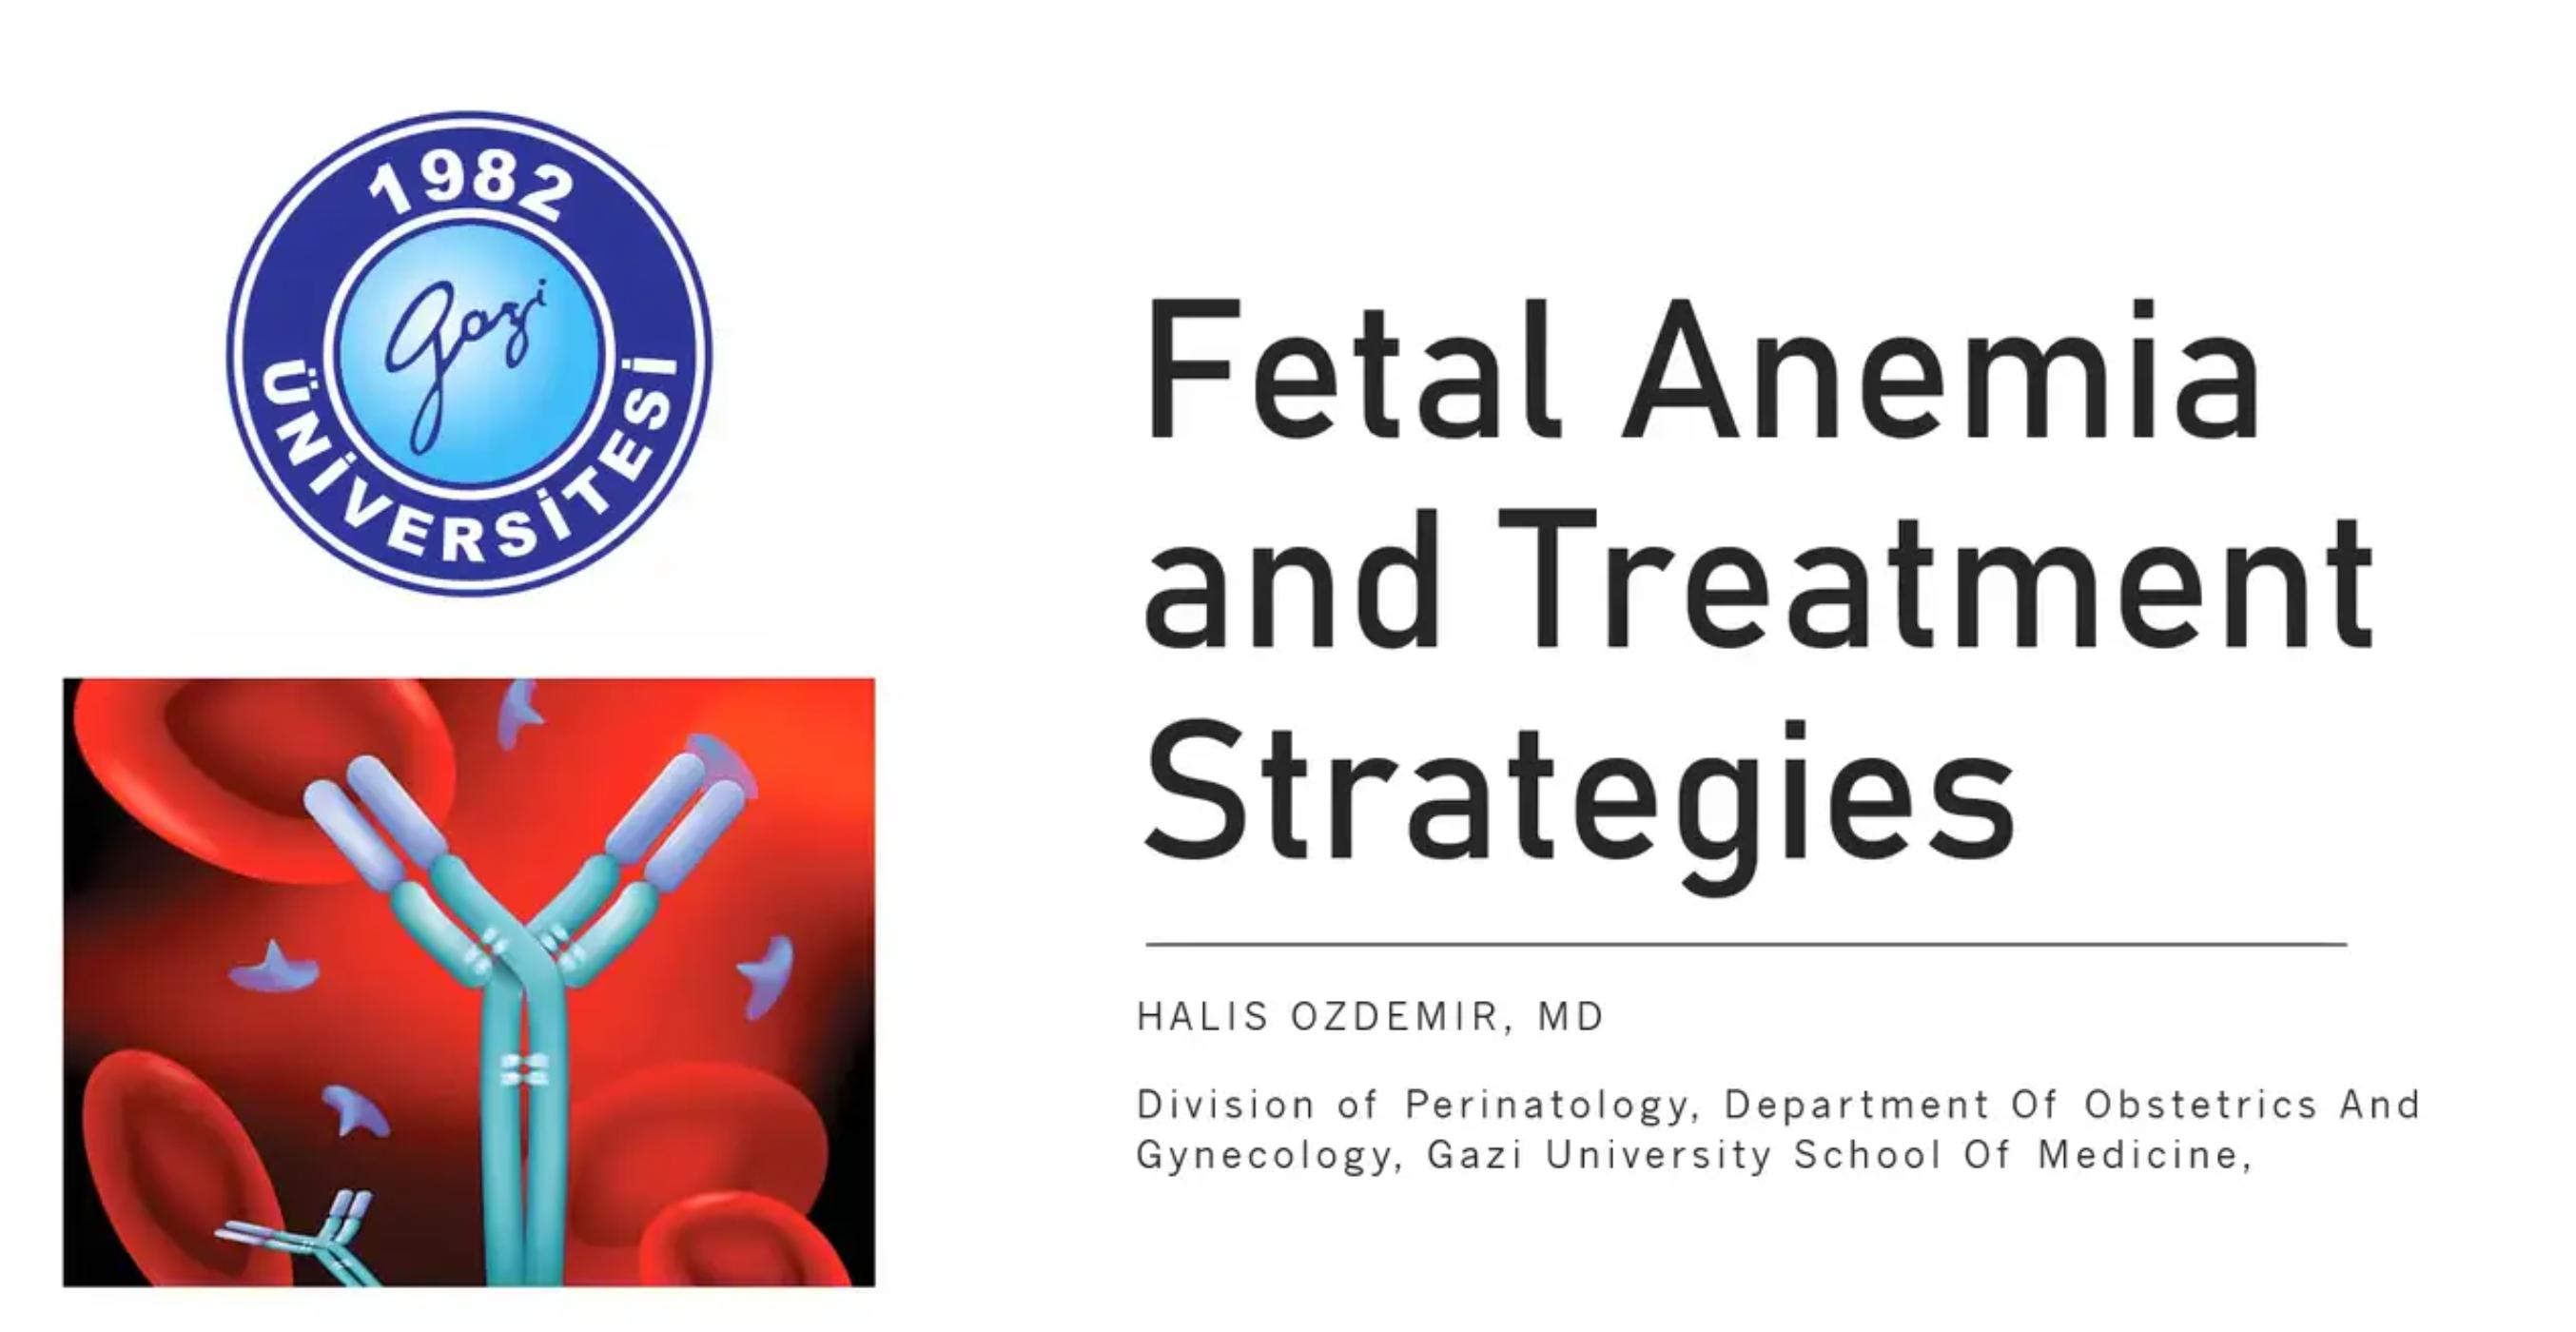 Fetal Anemia and Treatment Strategies